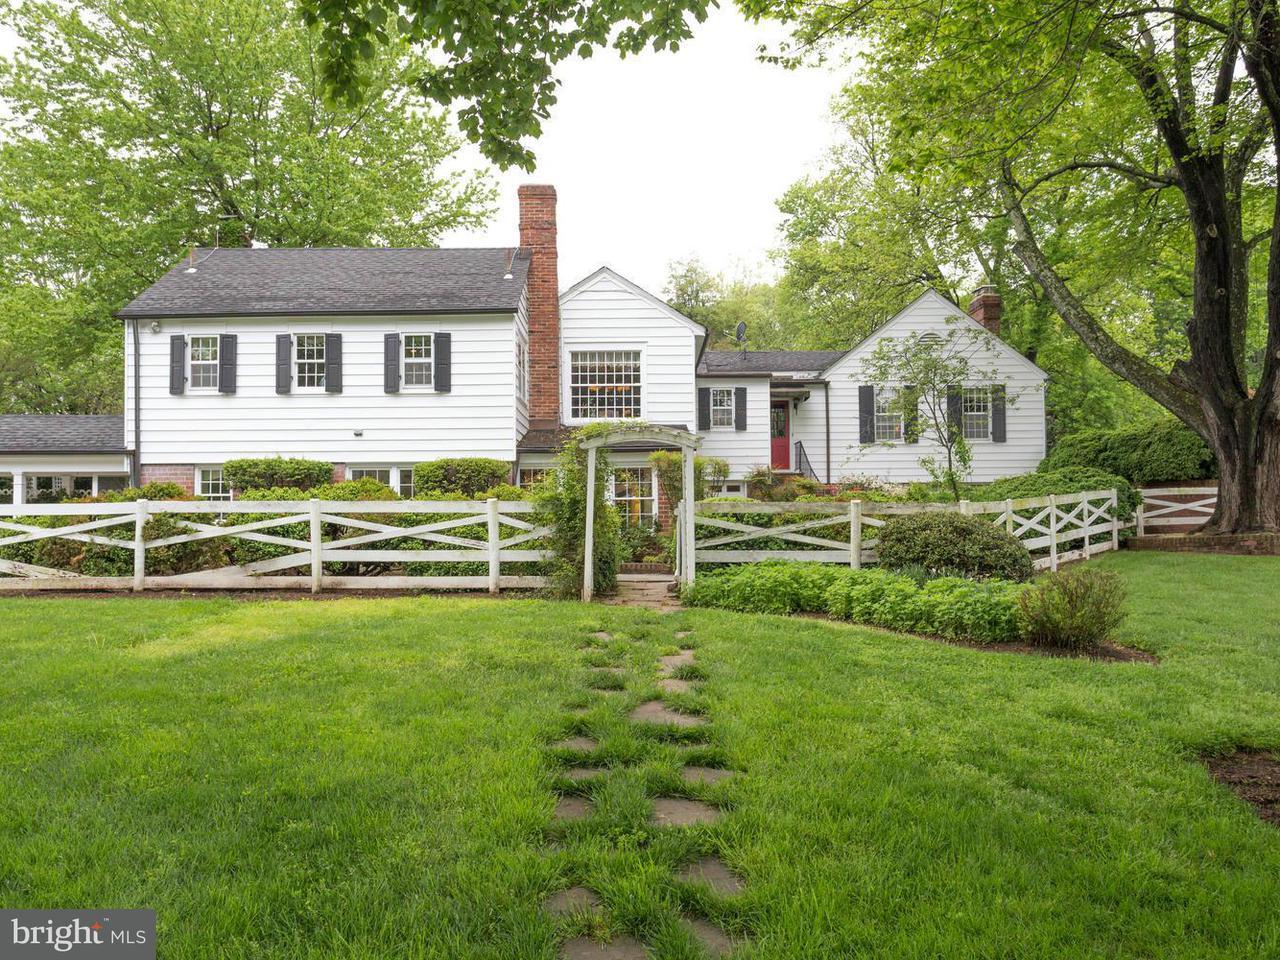 Single Family Home for Sale at 641 SENECA Road 641 SENECA Road Great Falls, Virginia 22066 United States